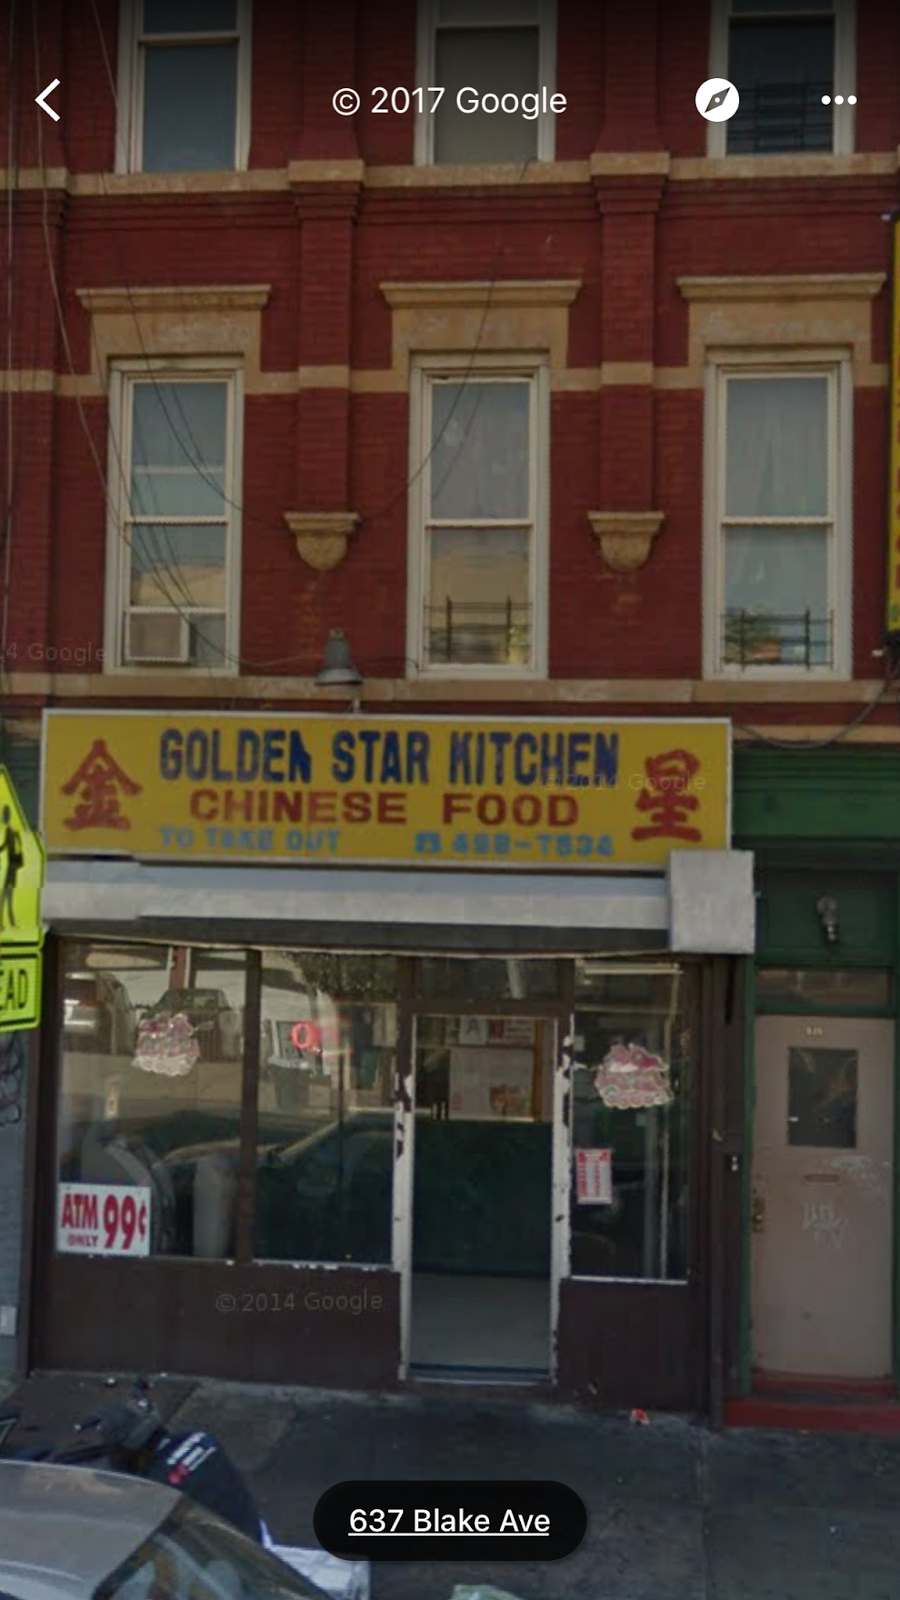 Golden Star Kitchen   restaurant   638 Blake Ave, Brooklyn, NY 11207, USA   7184987534 OR +1 718-498-7534